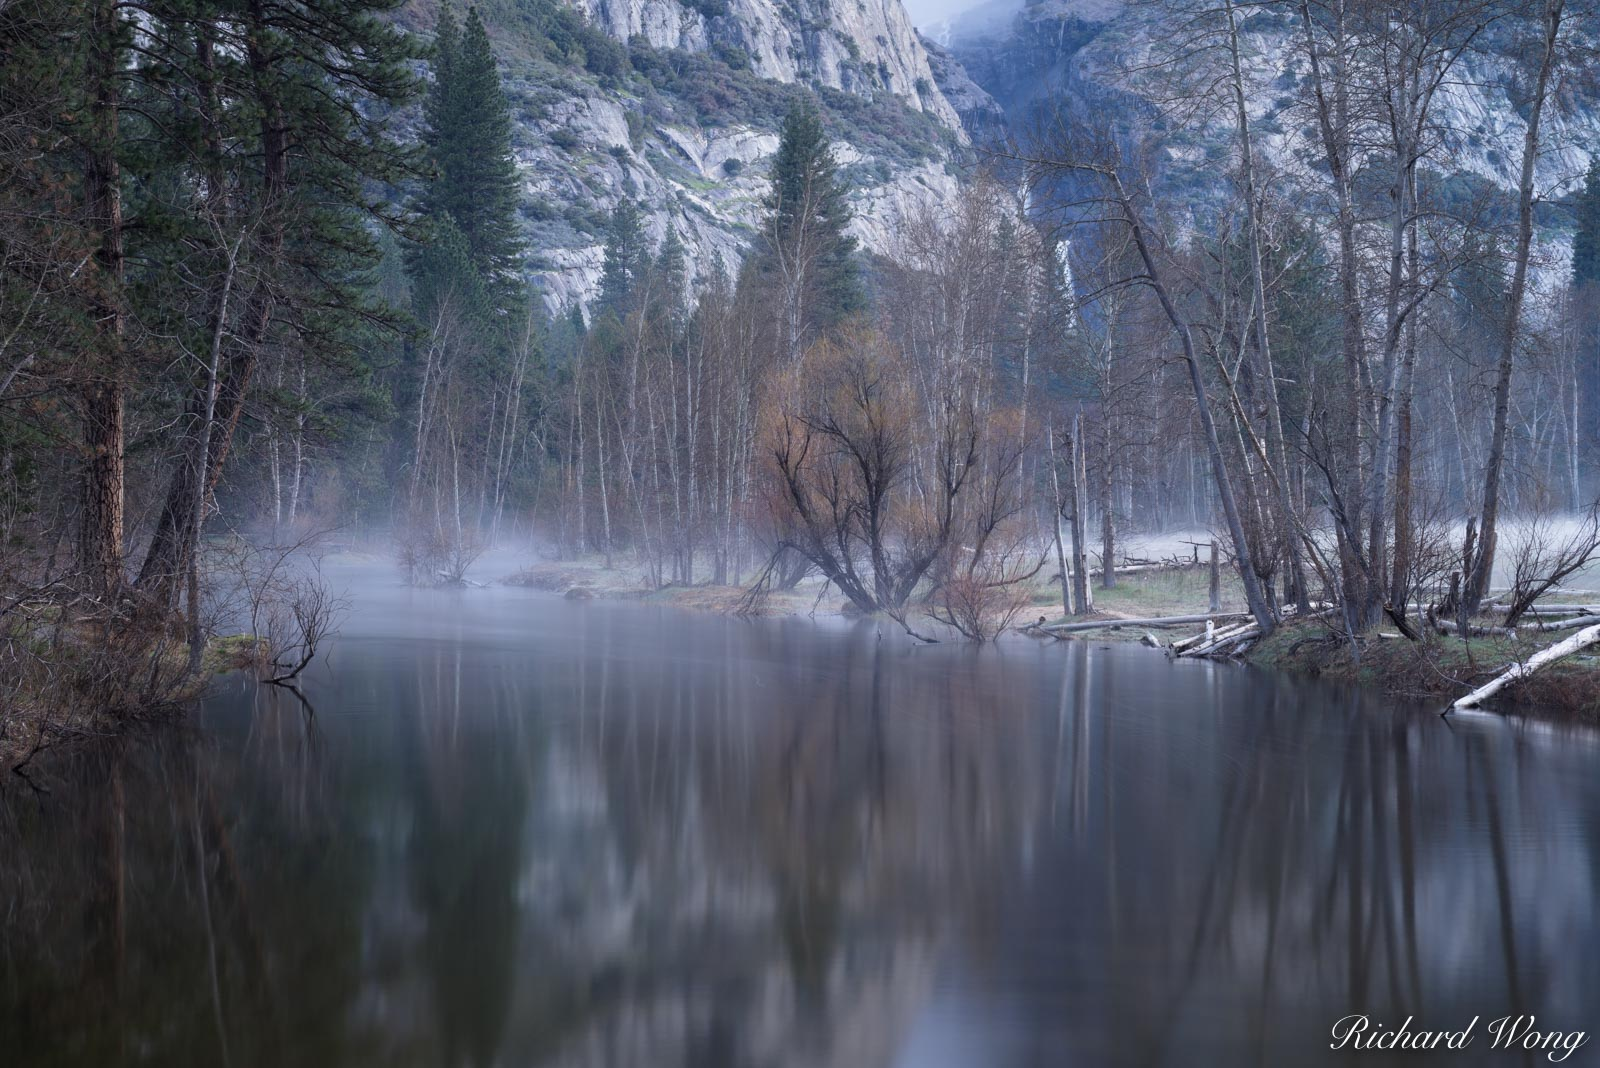 Morning Fog on Merced River, Yosemite National Park, California, photo, photo